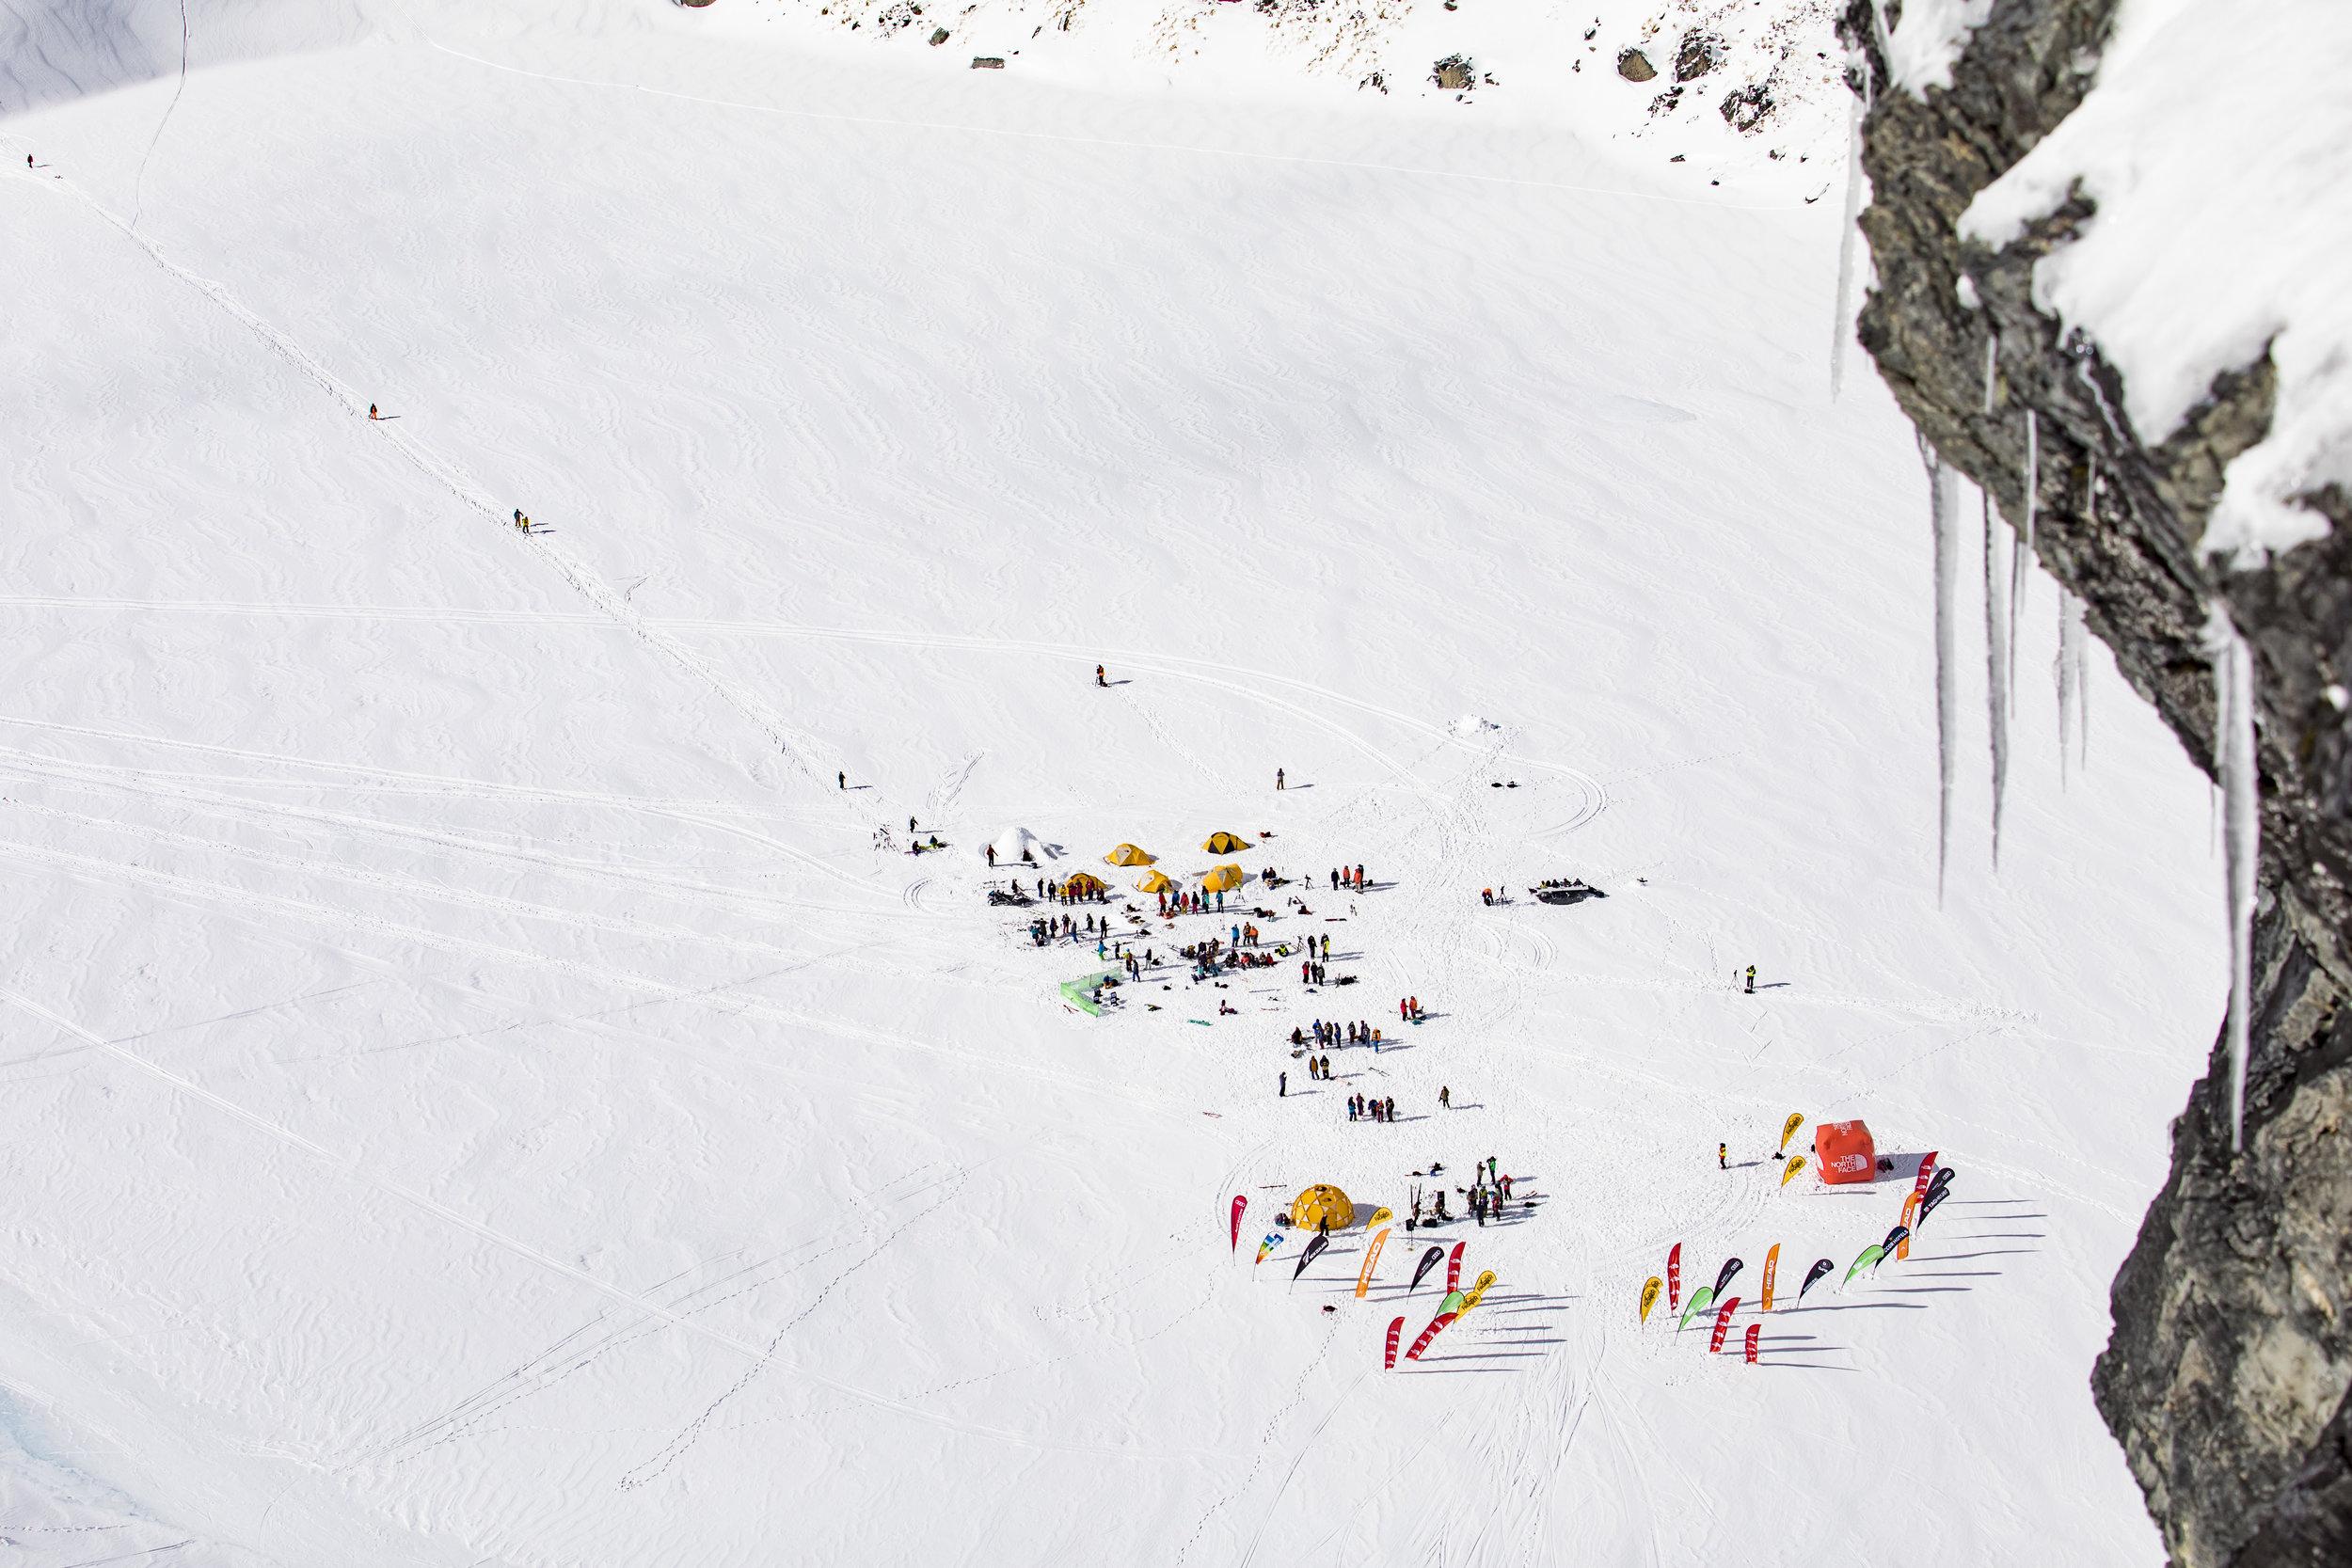 Finish zone - photo - neil Kerr